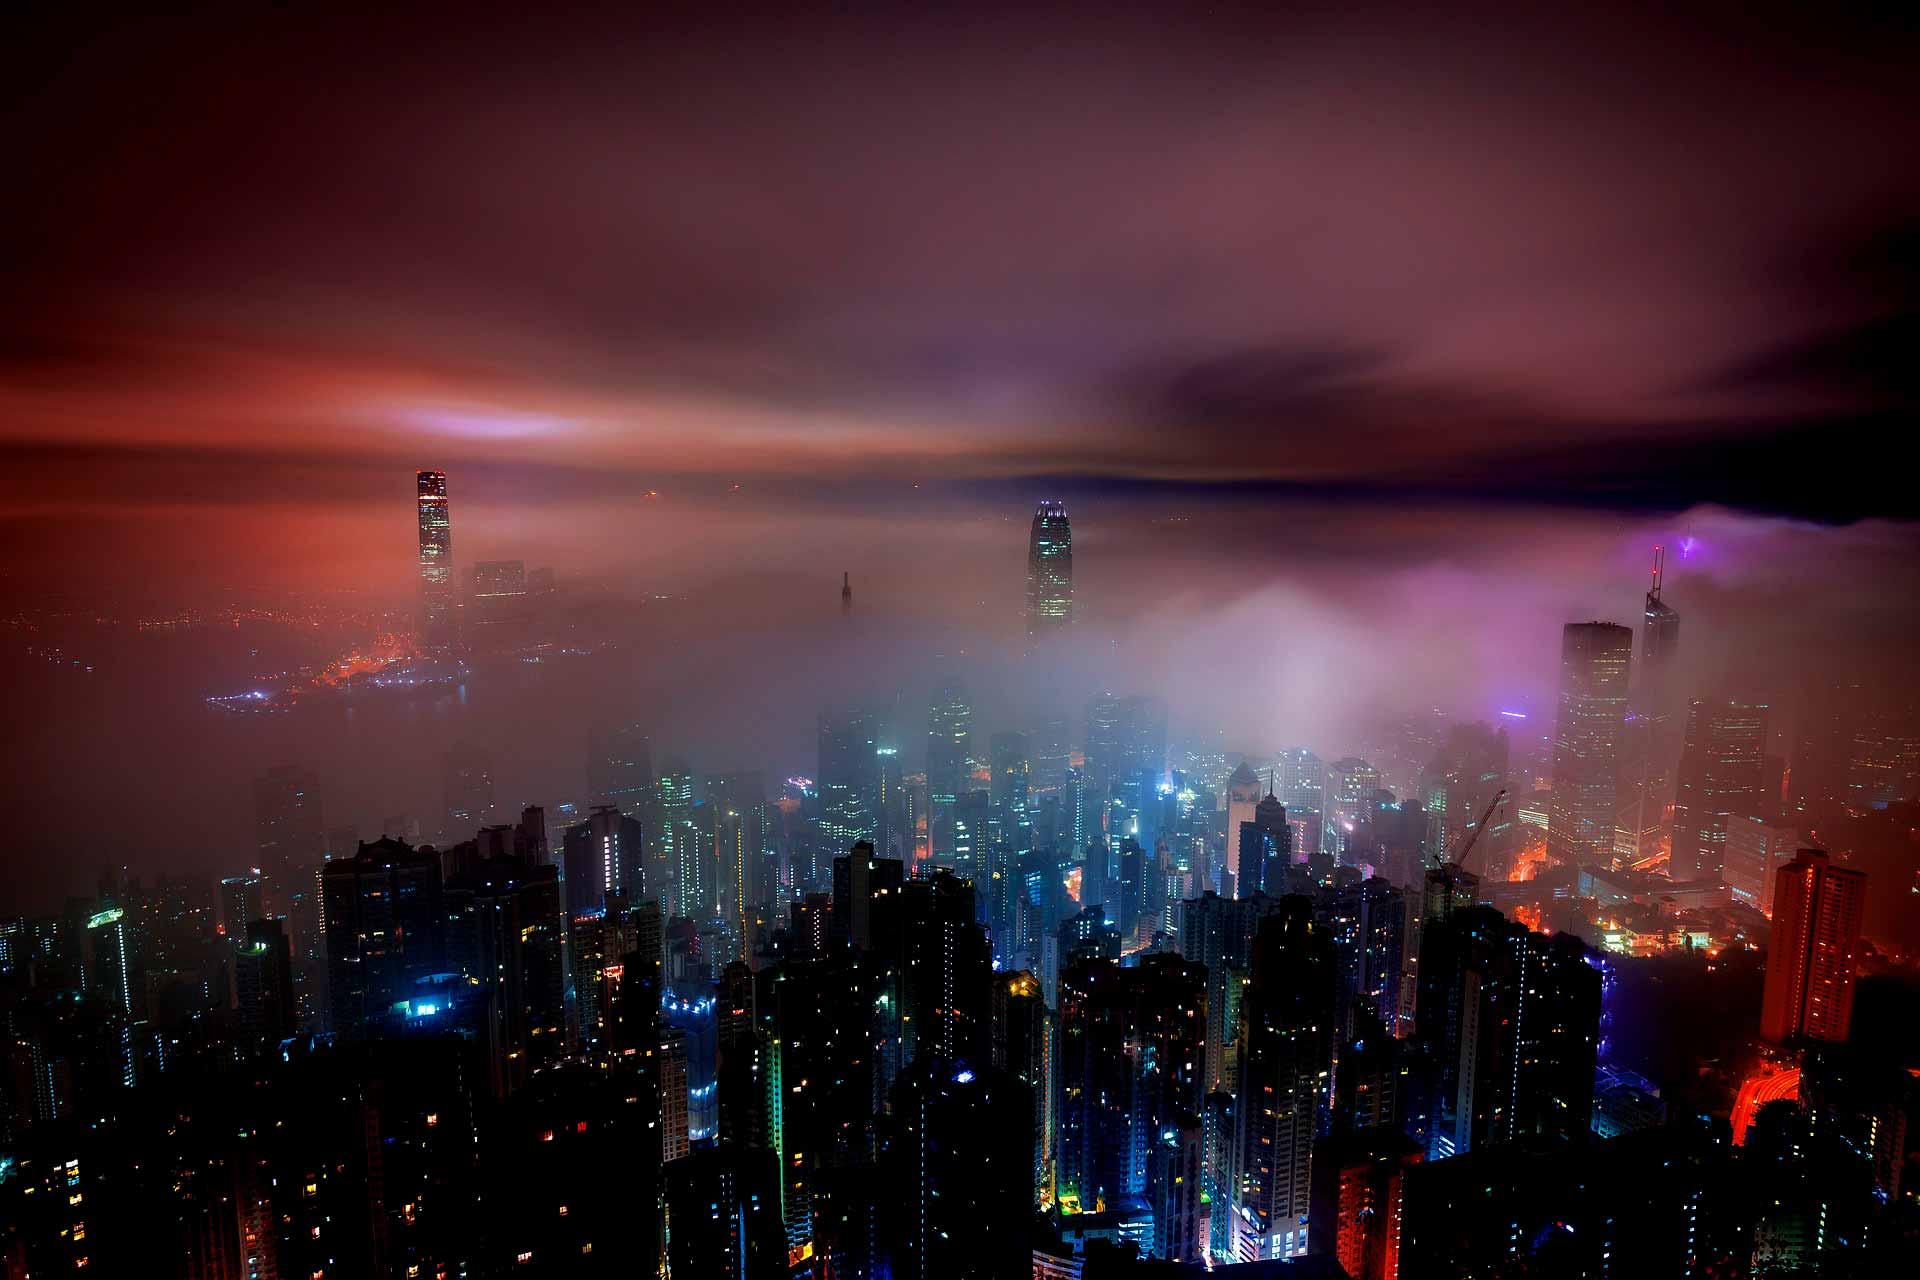 Hong Kong clouds by night